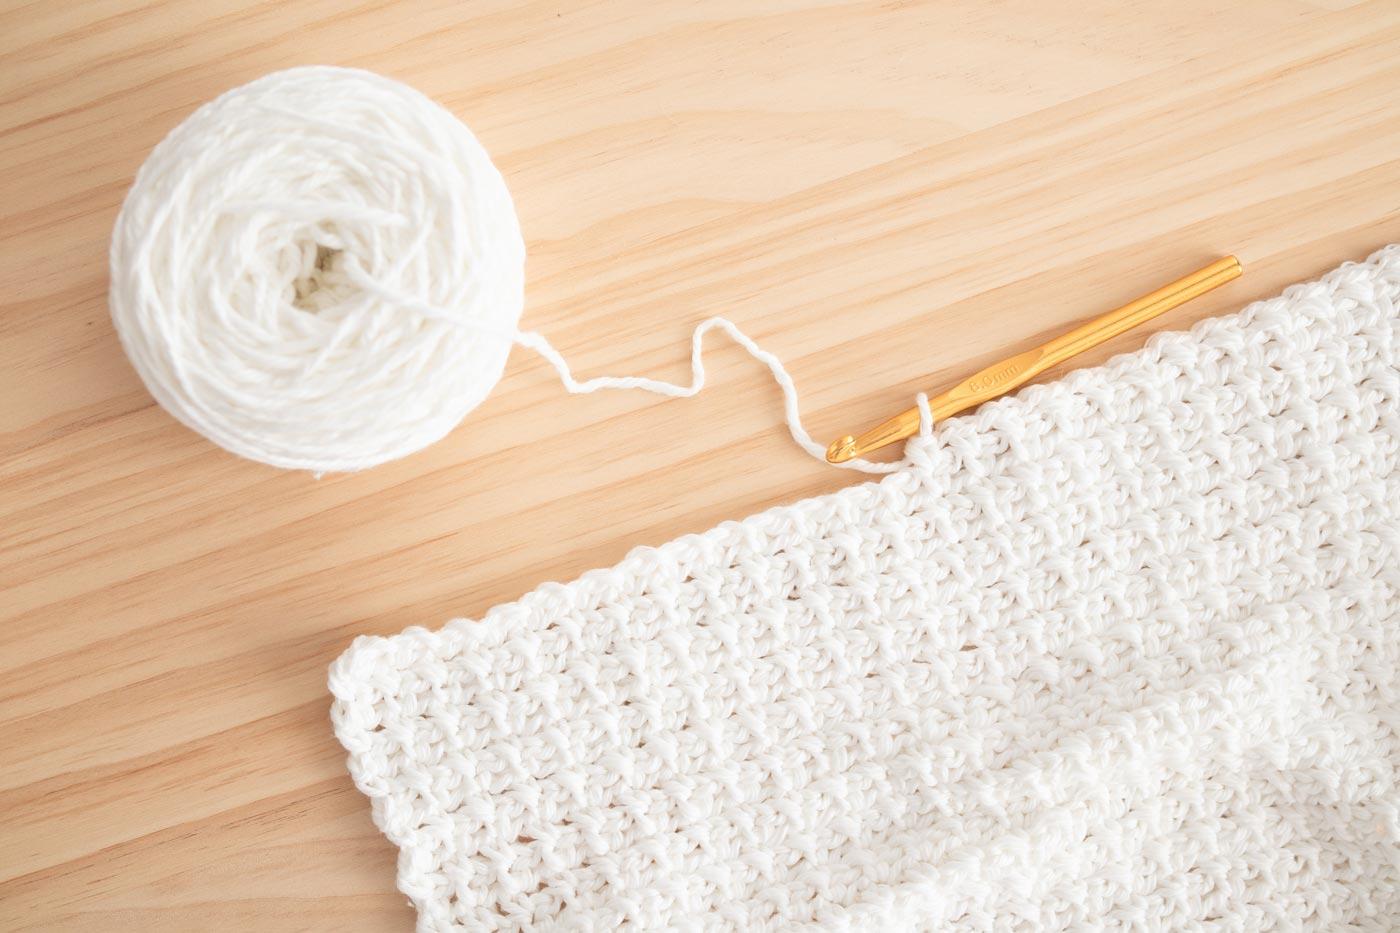 knit picks we crochet pima cotton swatch in single crochet column stitch with crochet hook